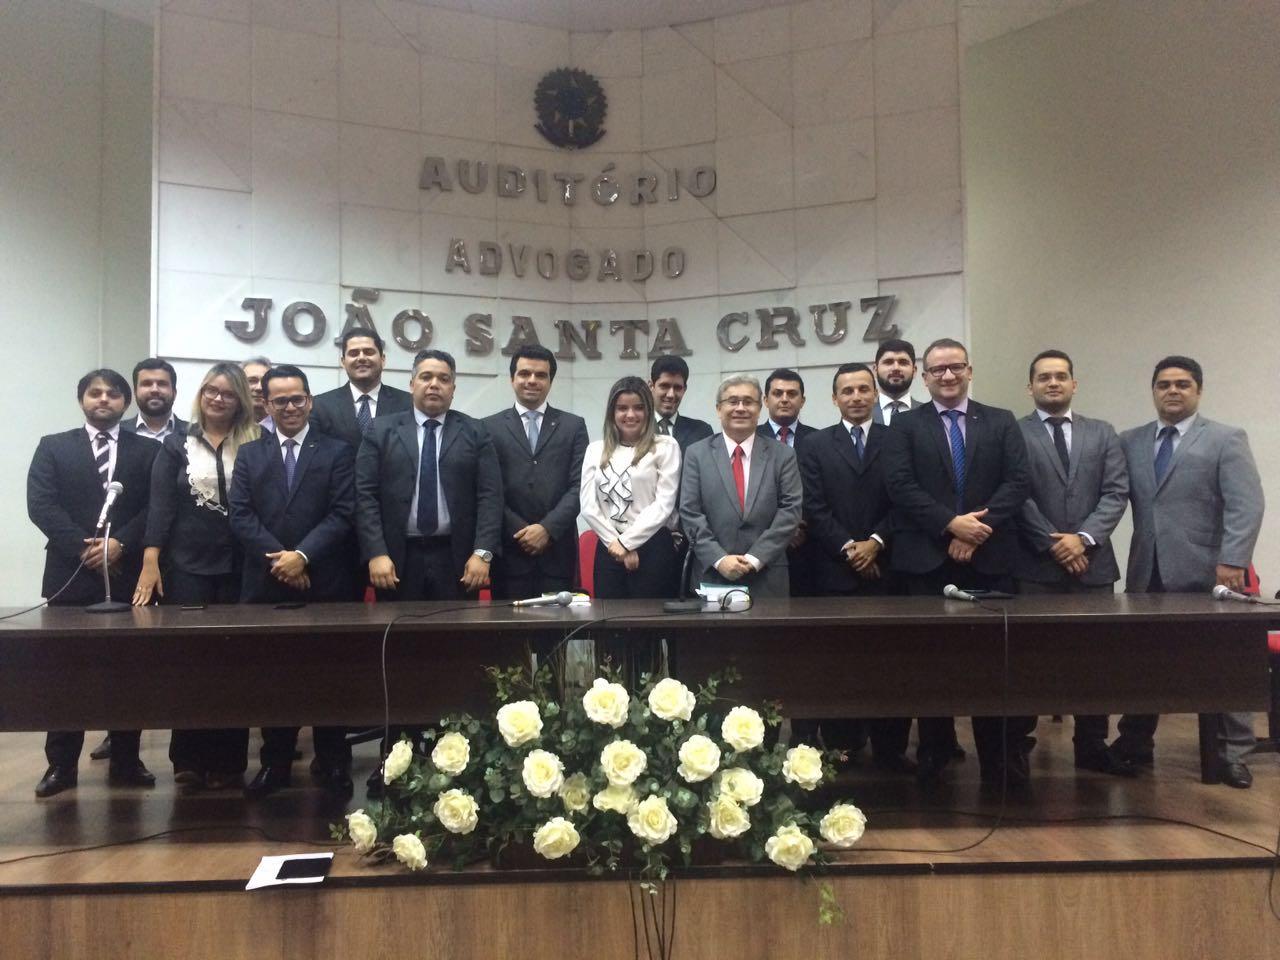 OAB-PB realiza palestra sobre prerrogativas dos advogados no período eleitoral